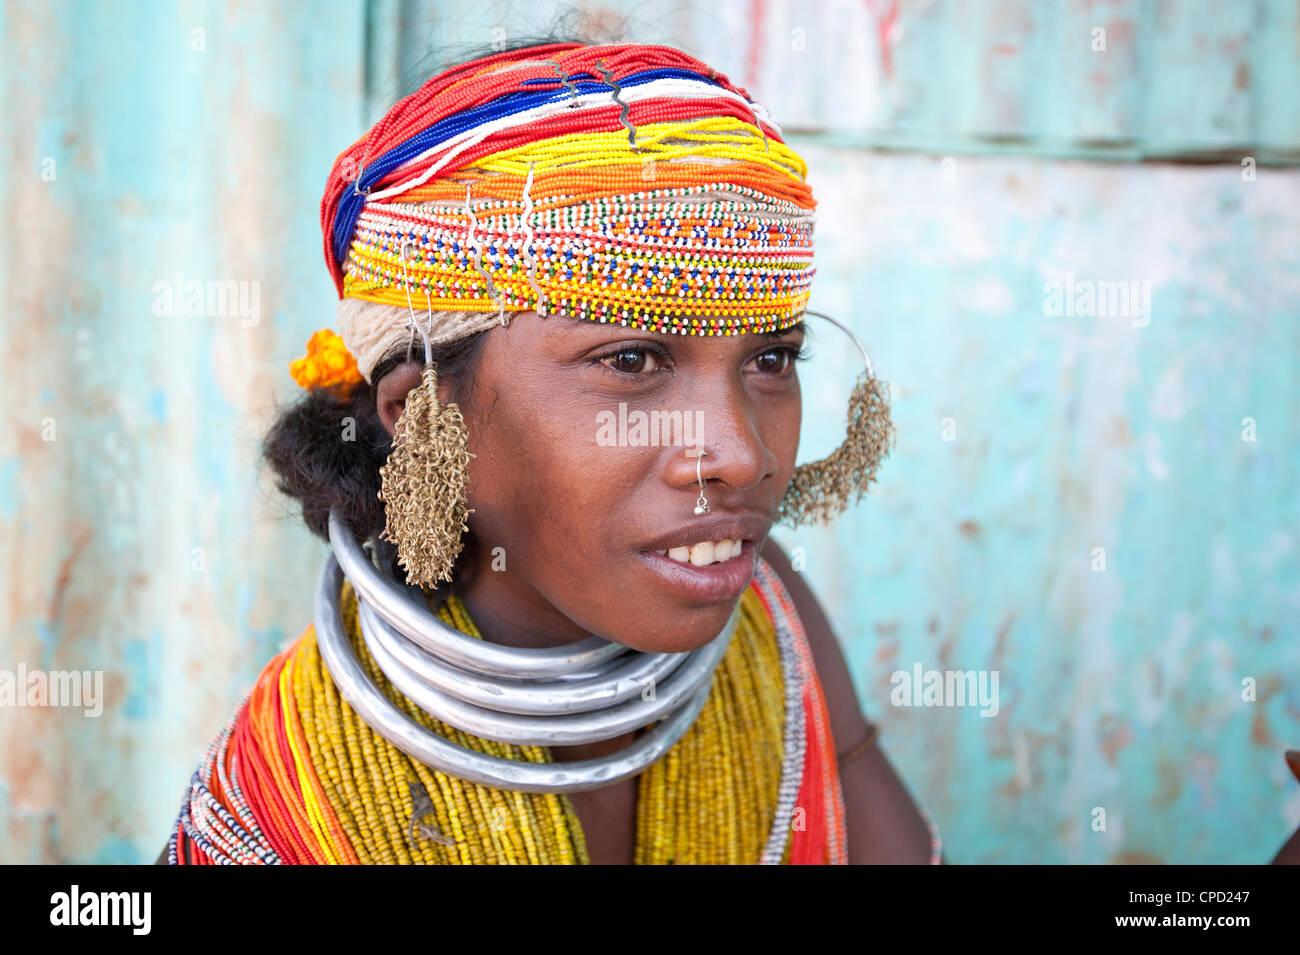 Bonda Tribeswoman traditionelle Wulst-Kostüm, Rayagader, Orissa, Indien Stockbild